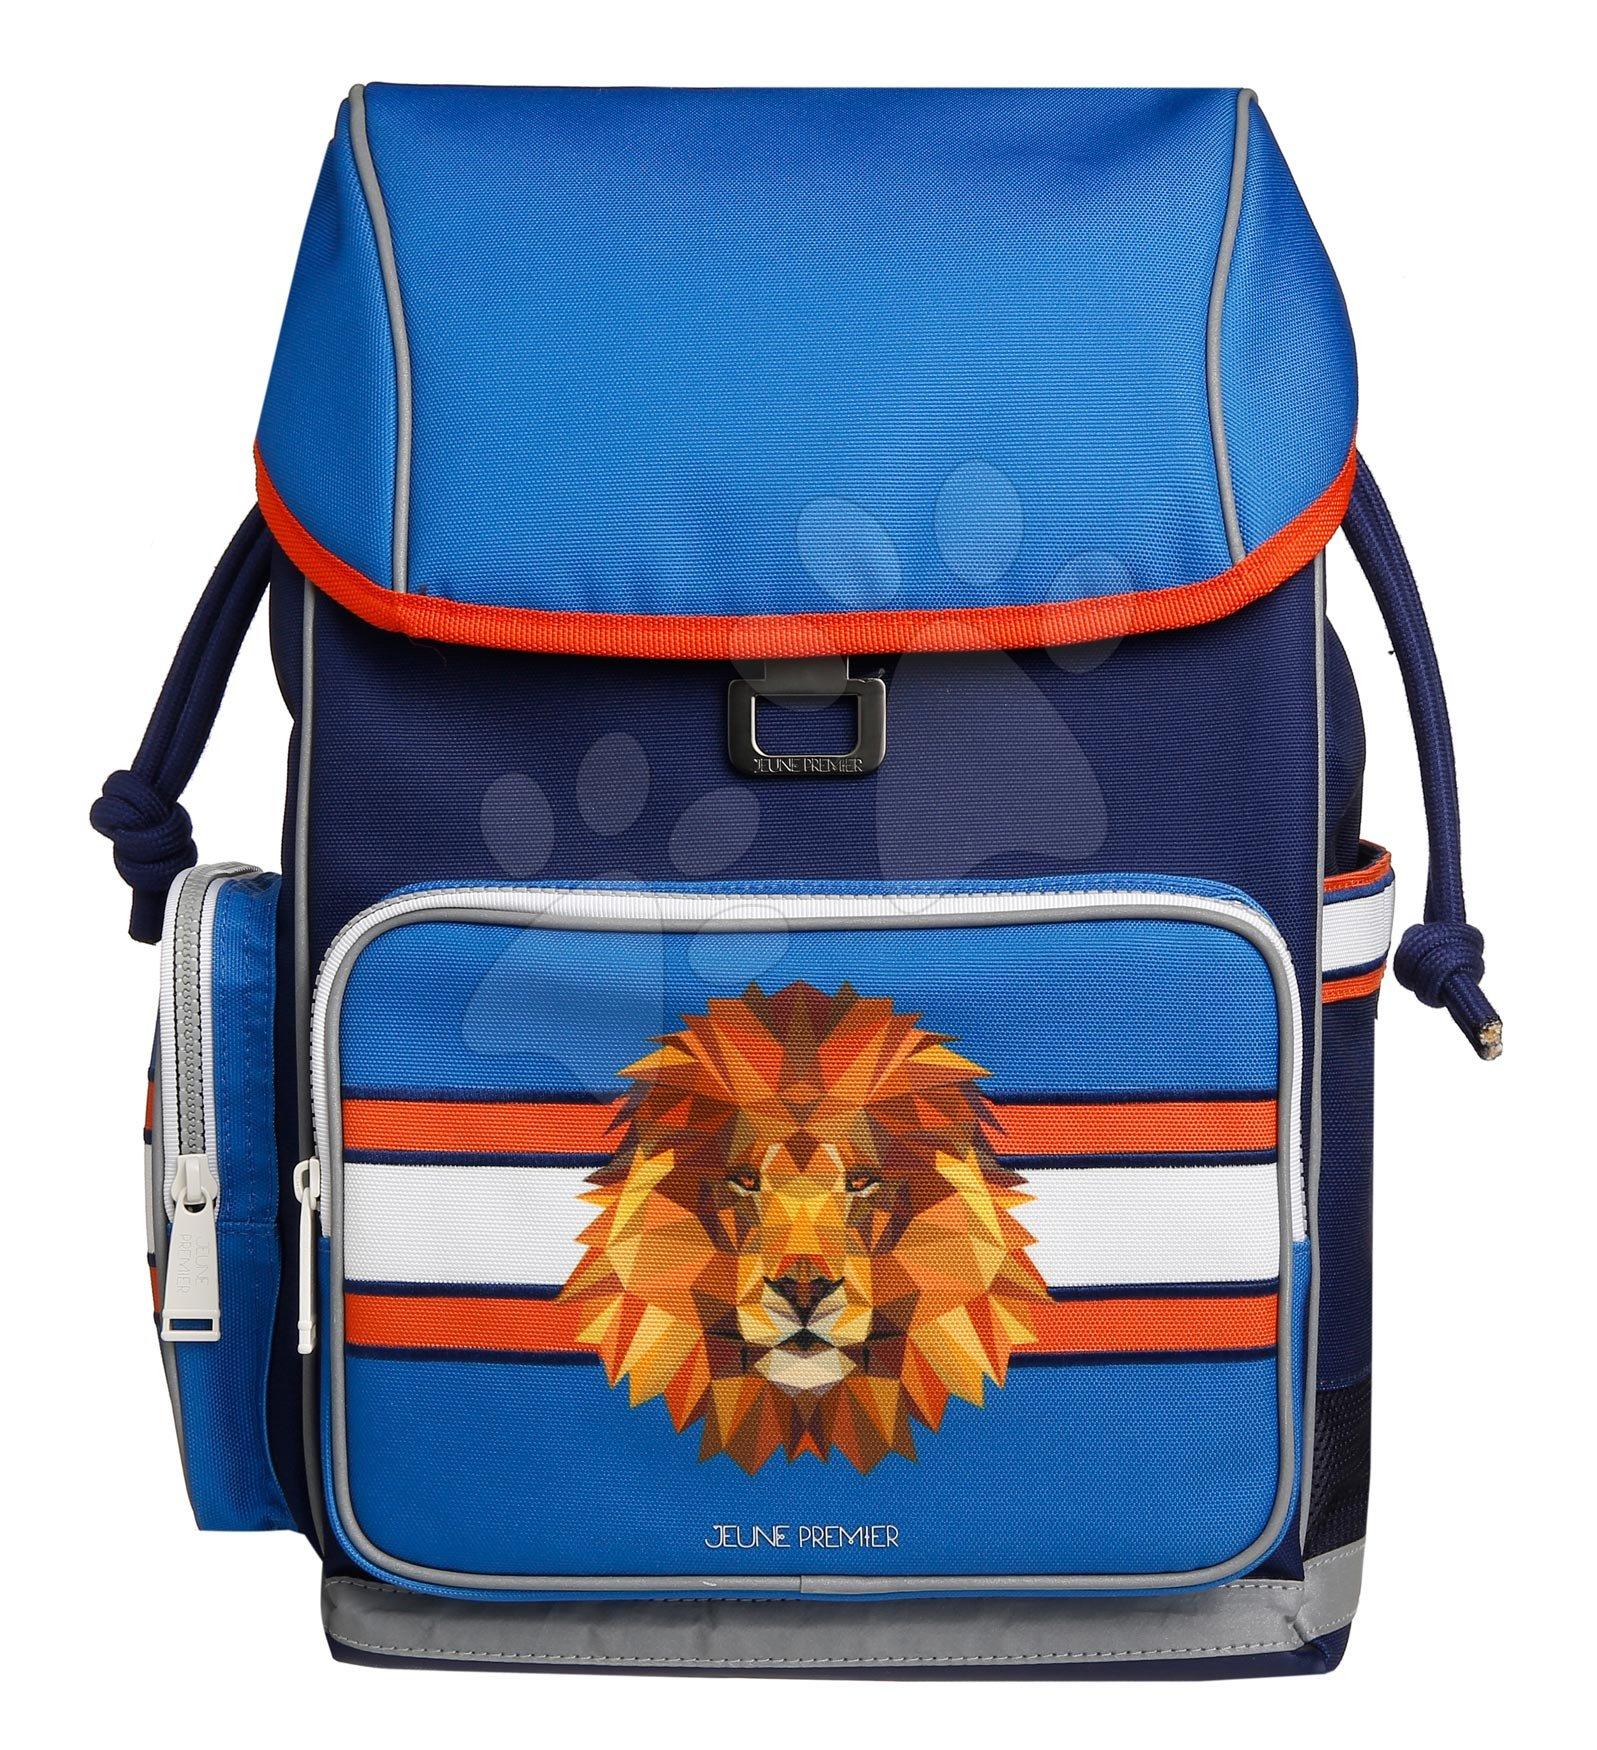 Školske torbe i ruksaci - Školski ruksak veliki Ergomax Lion Head Jeune Premier ergonomski luksuzni dizajn